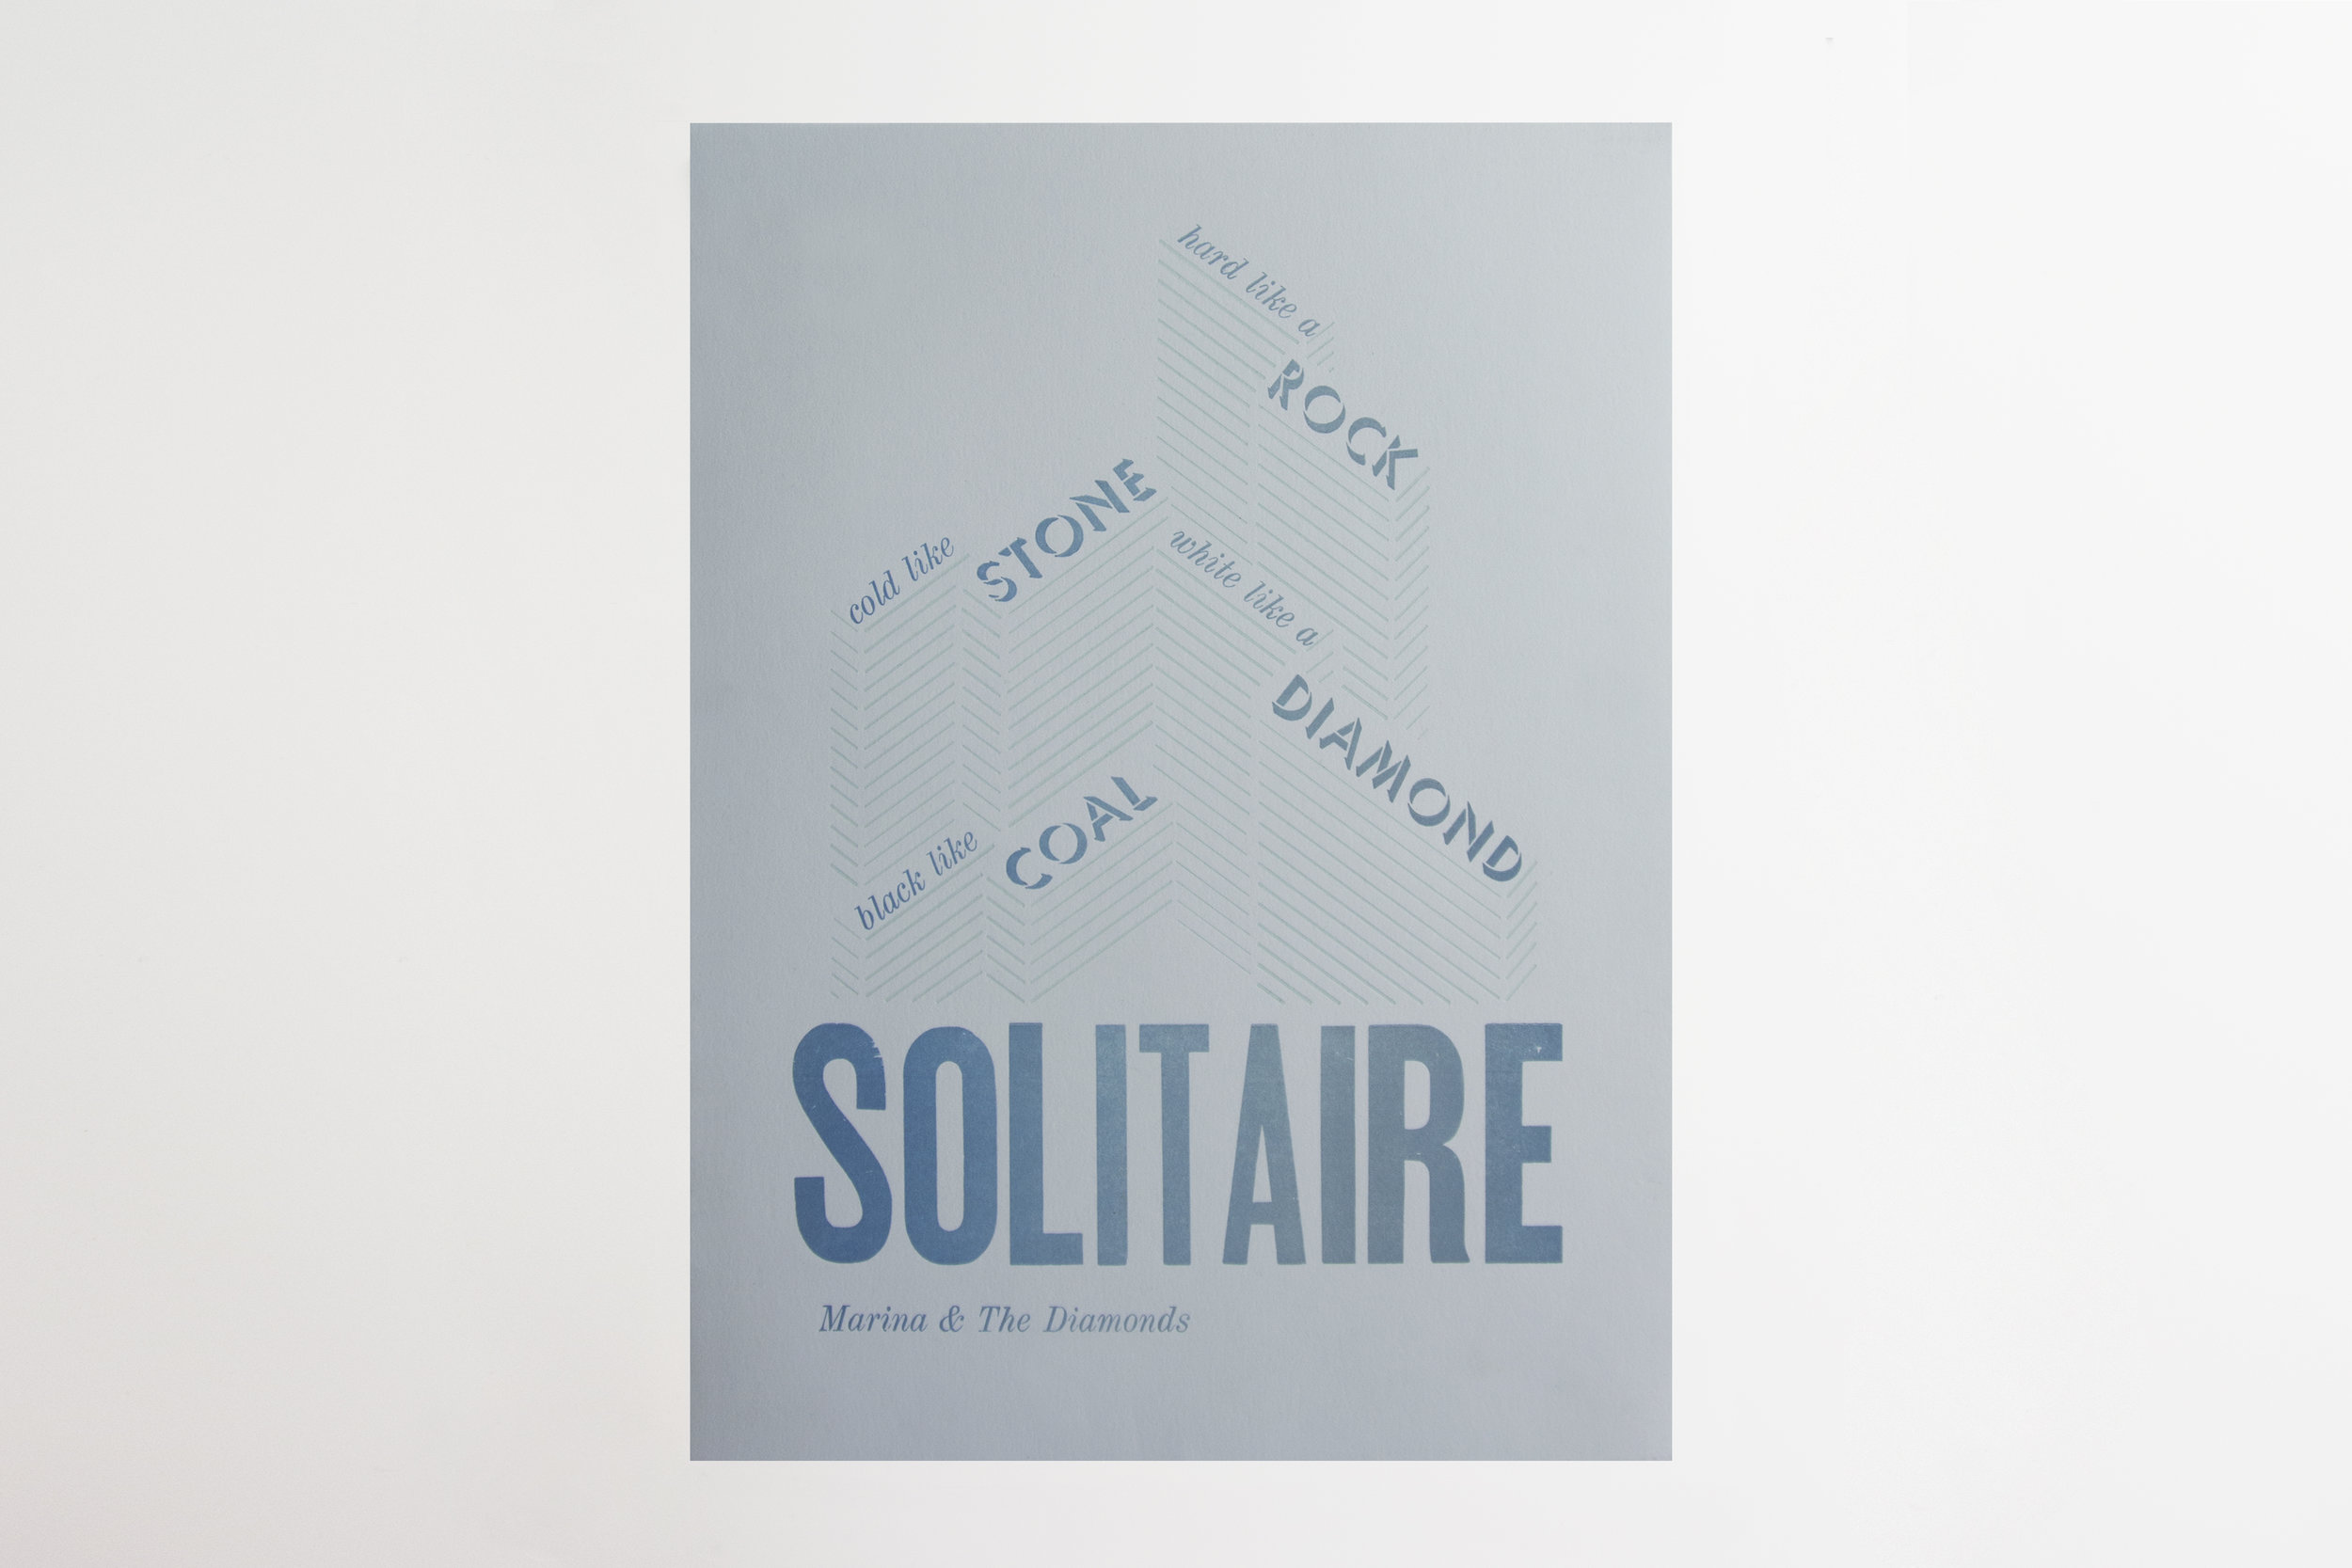 solitaire2.jpg